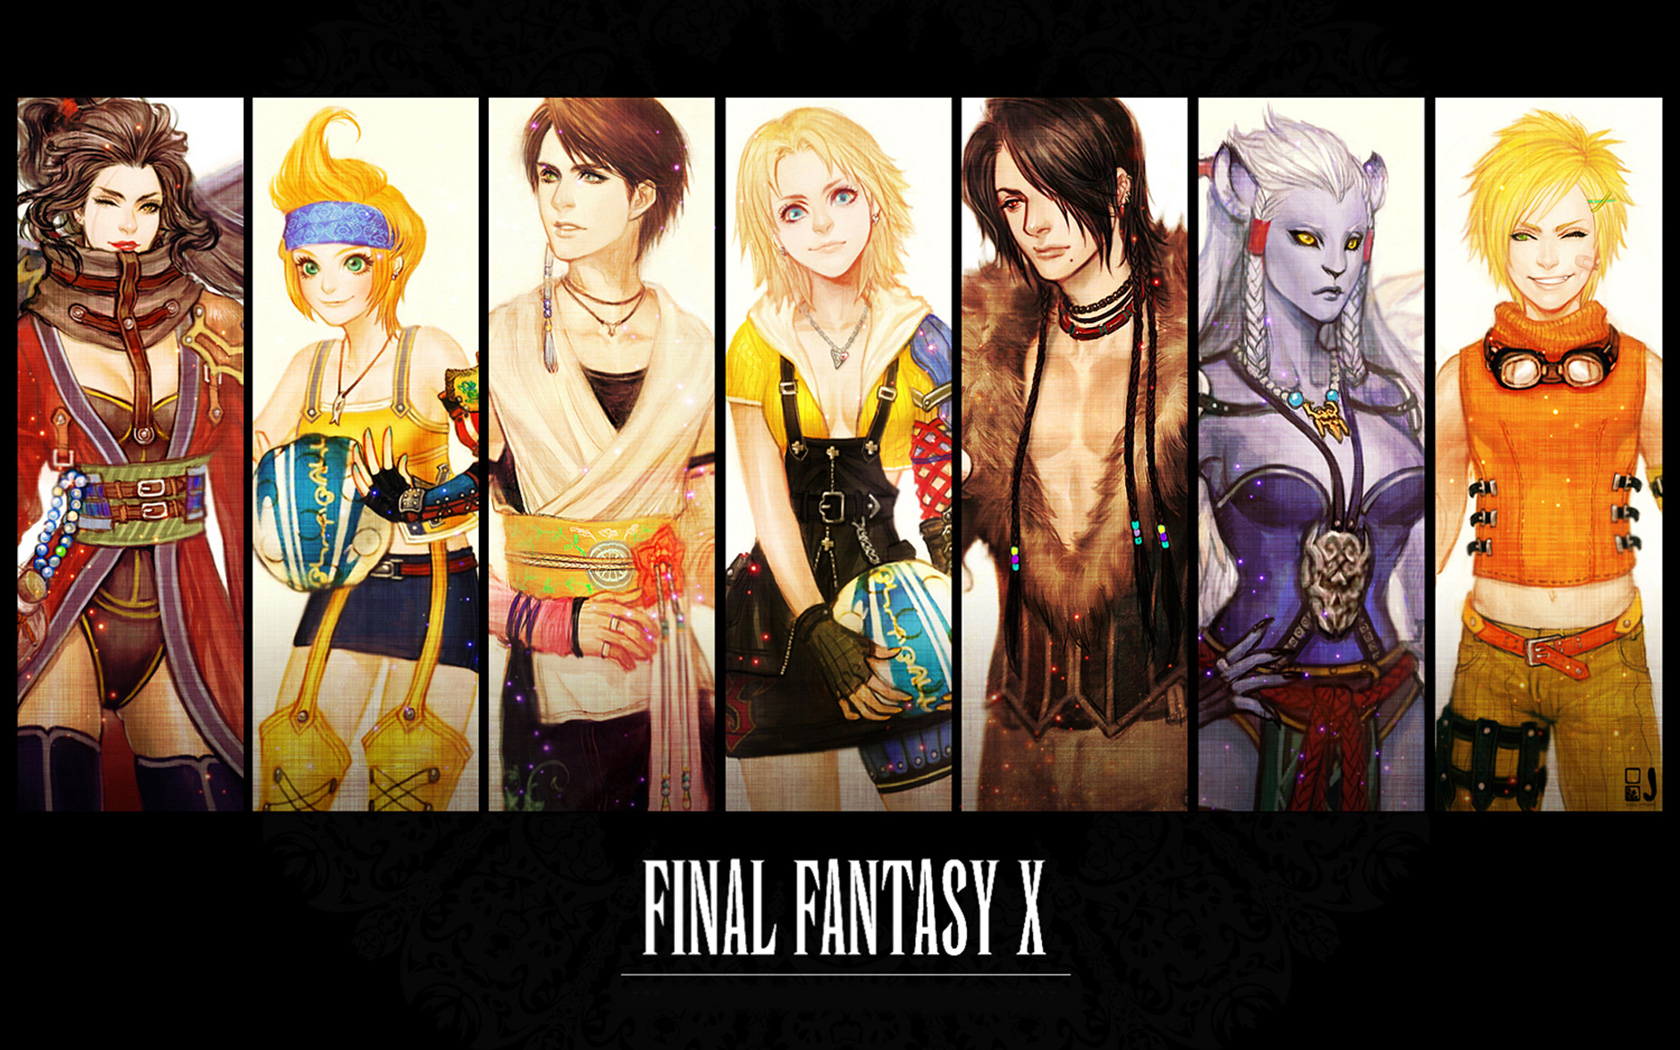 Free Final Fantasy X Wallpaper in 1680x1050